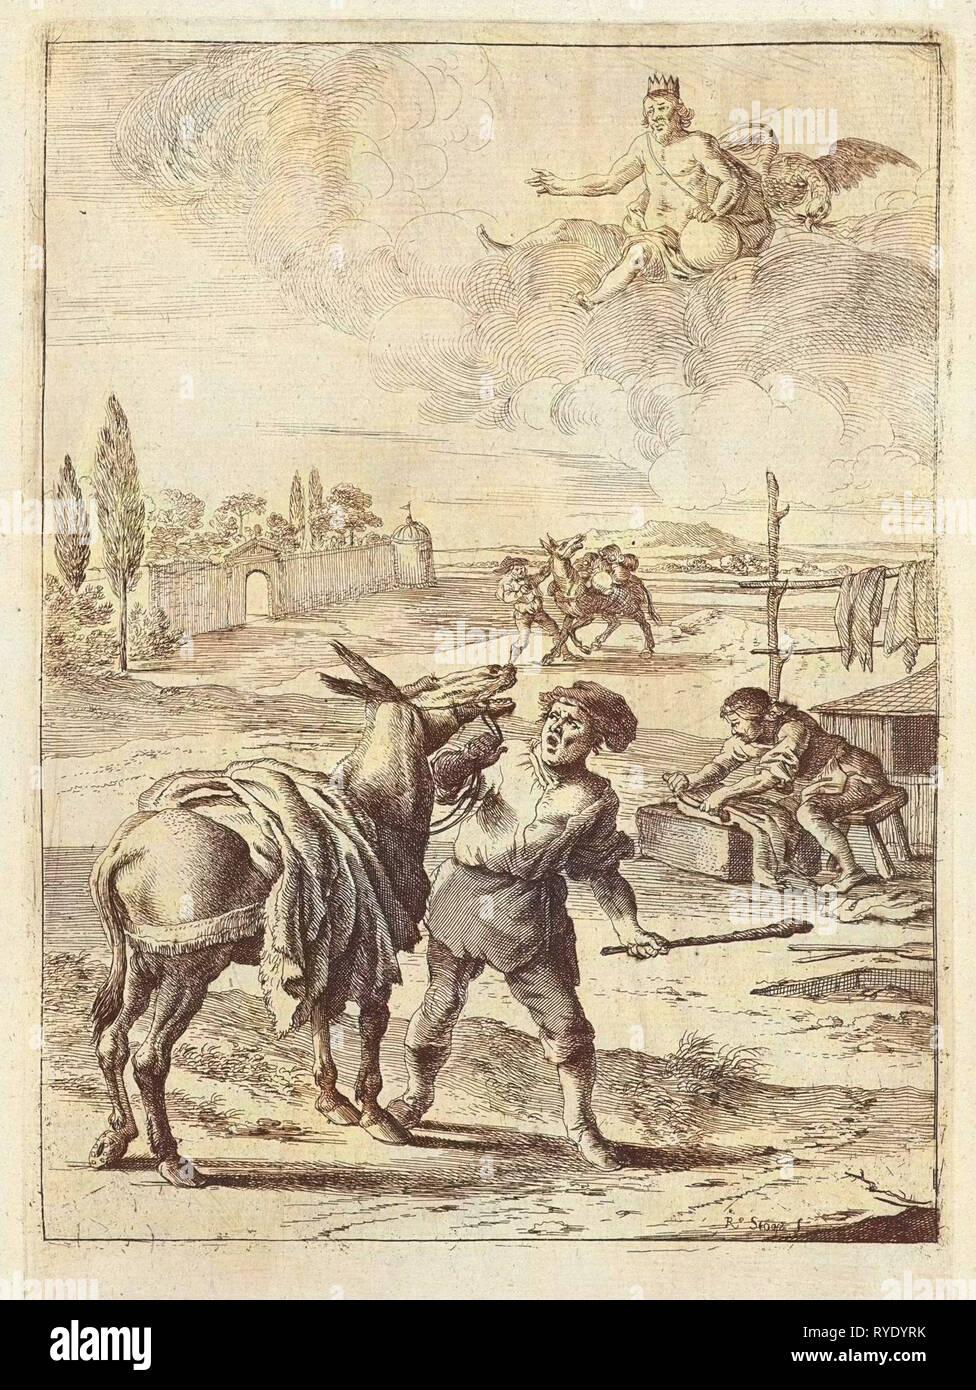 Myth of Jupiter and the donkey, Dirk Stoop, John Ogilby, 1665 - Stock Image